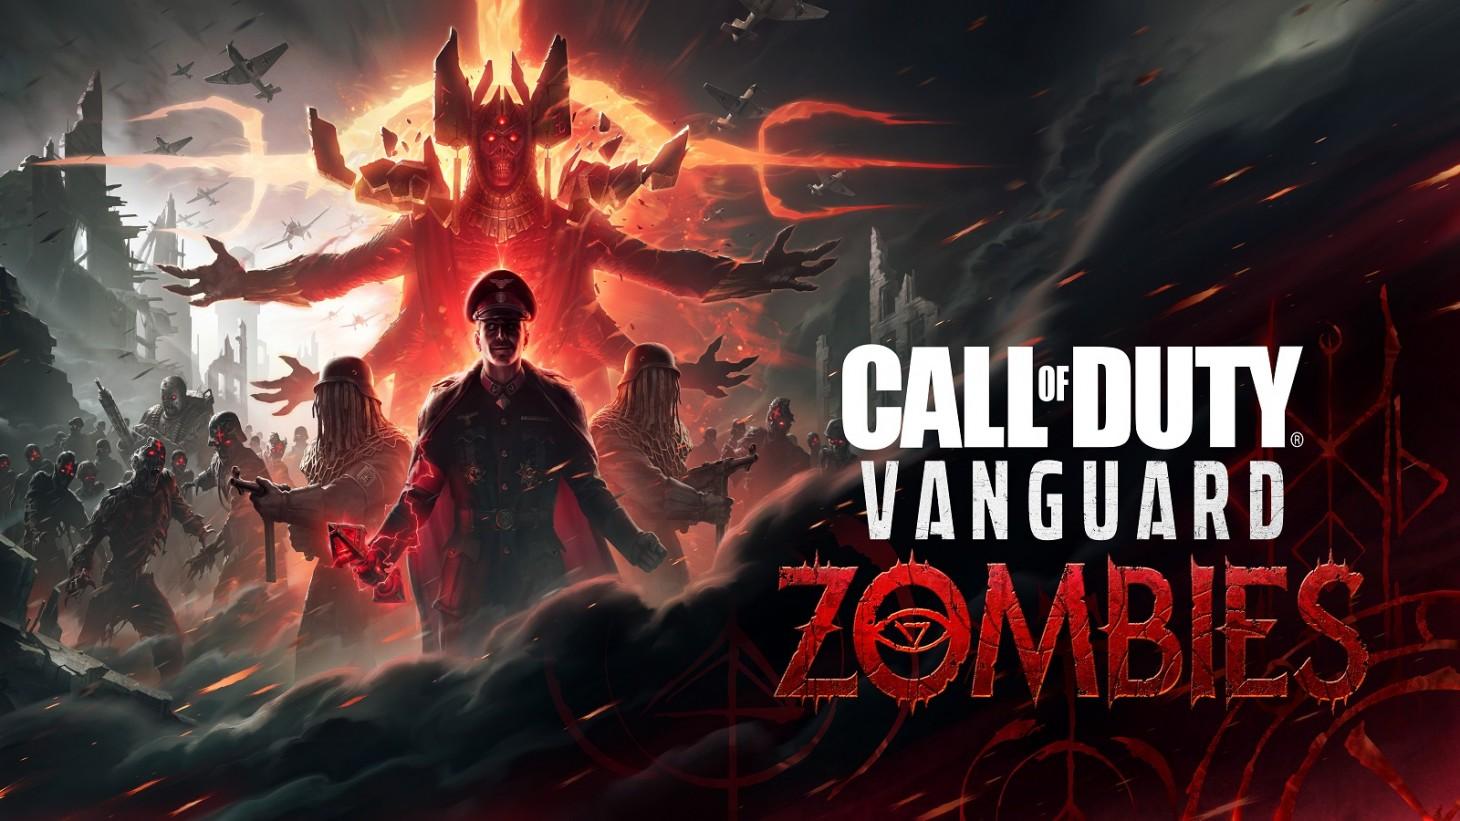 Call of Duty: Vanguard Zombies